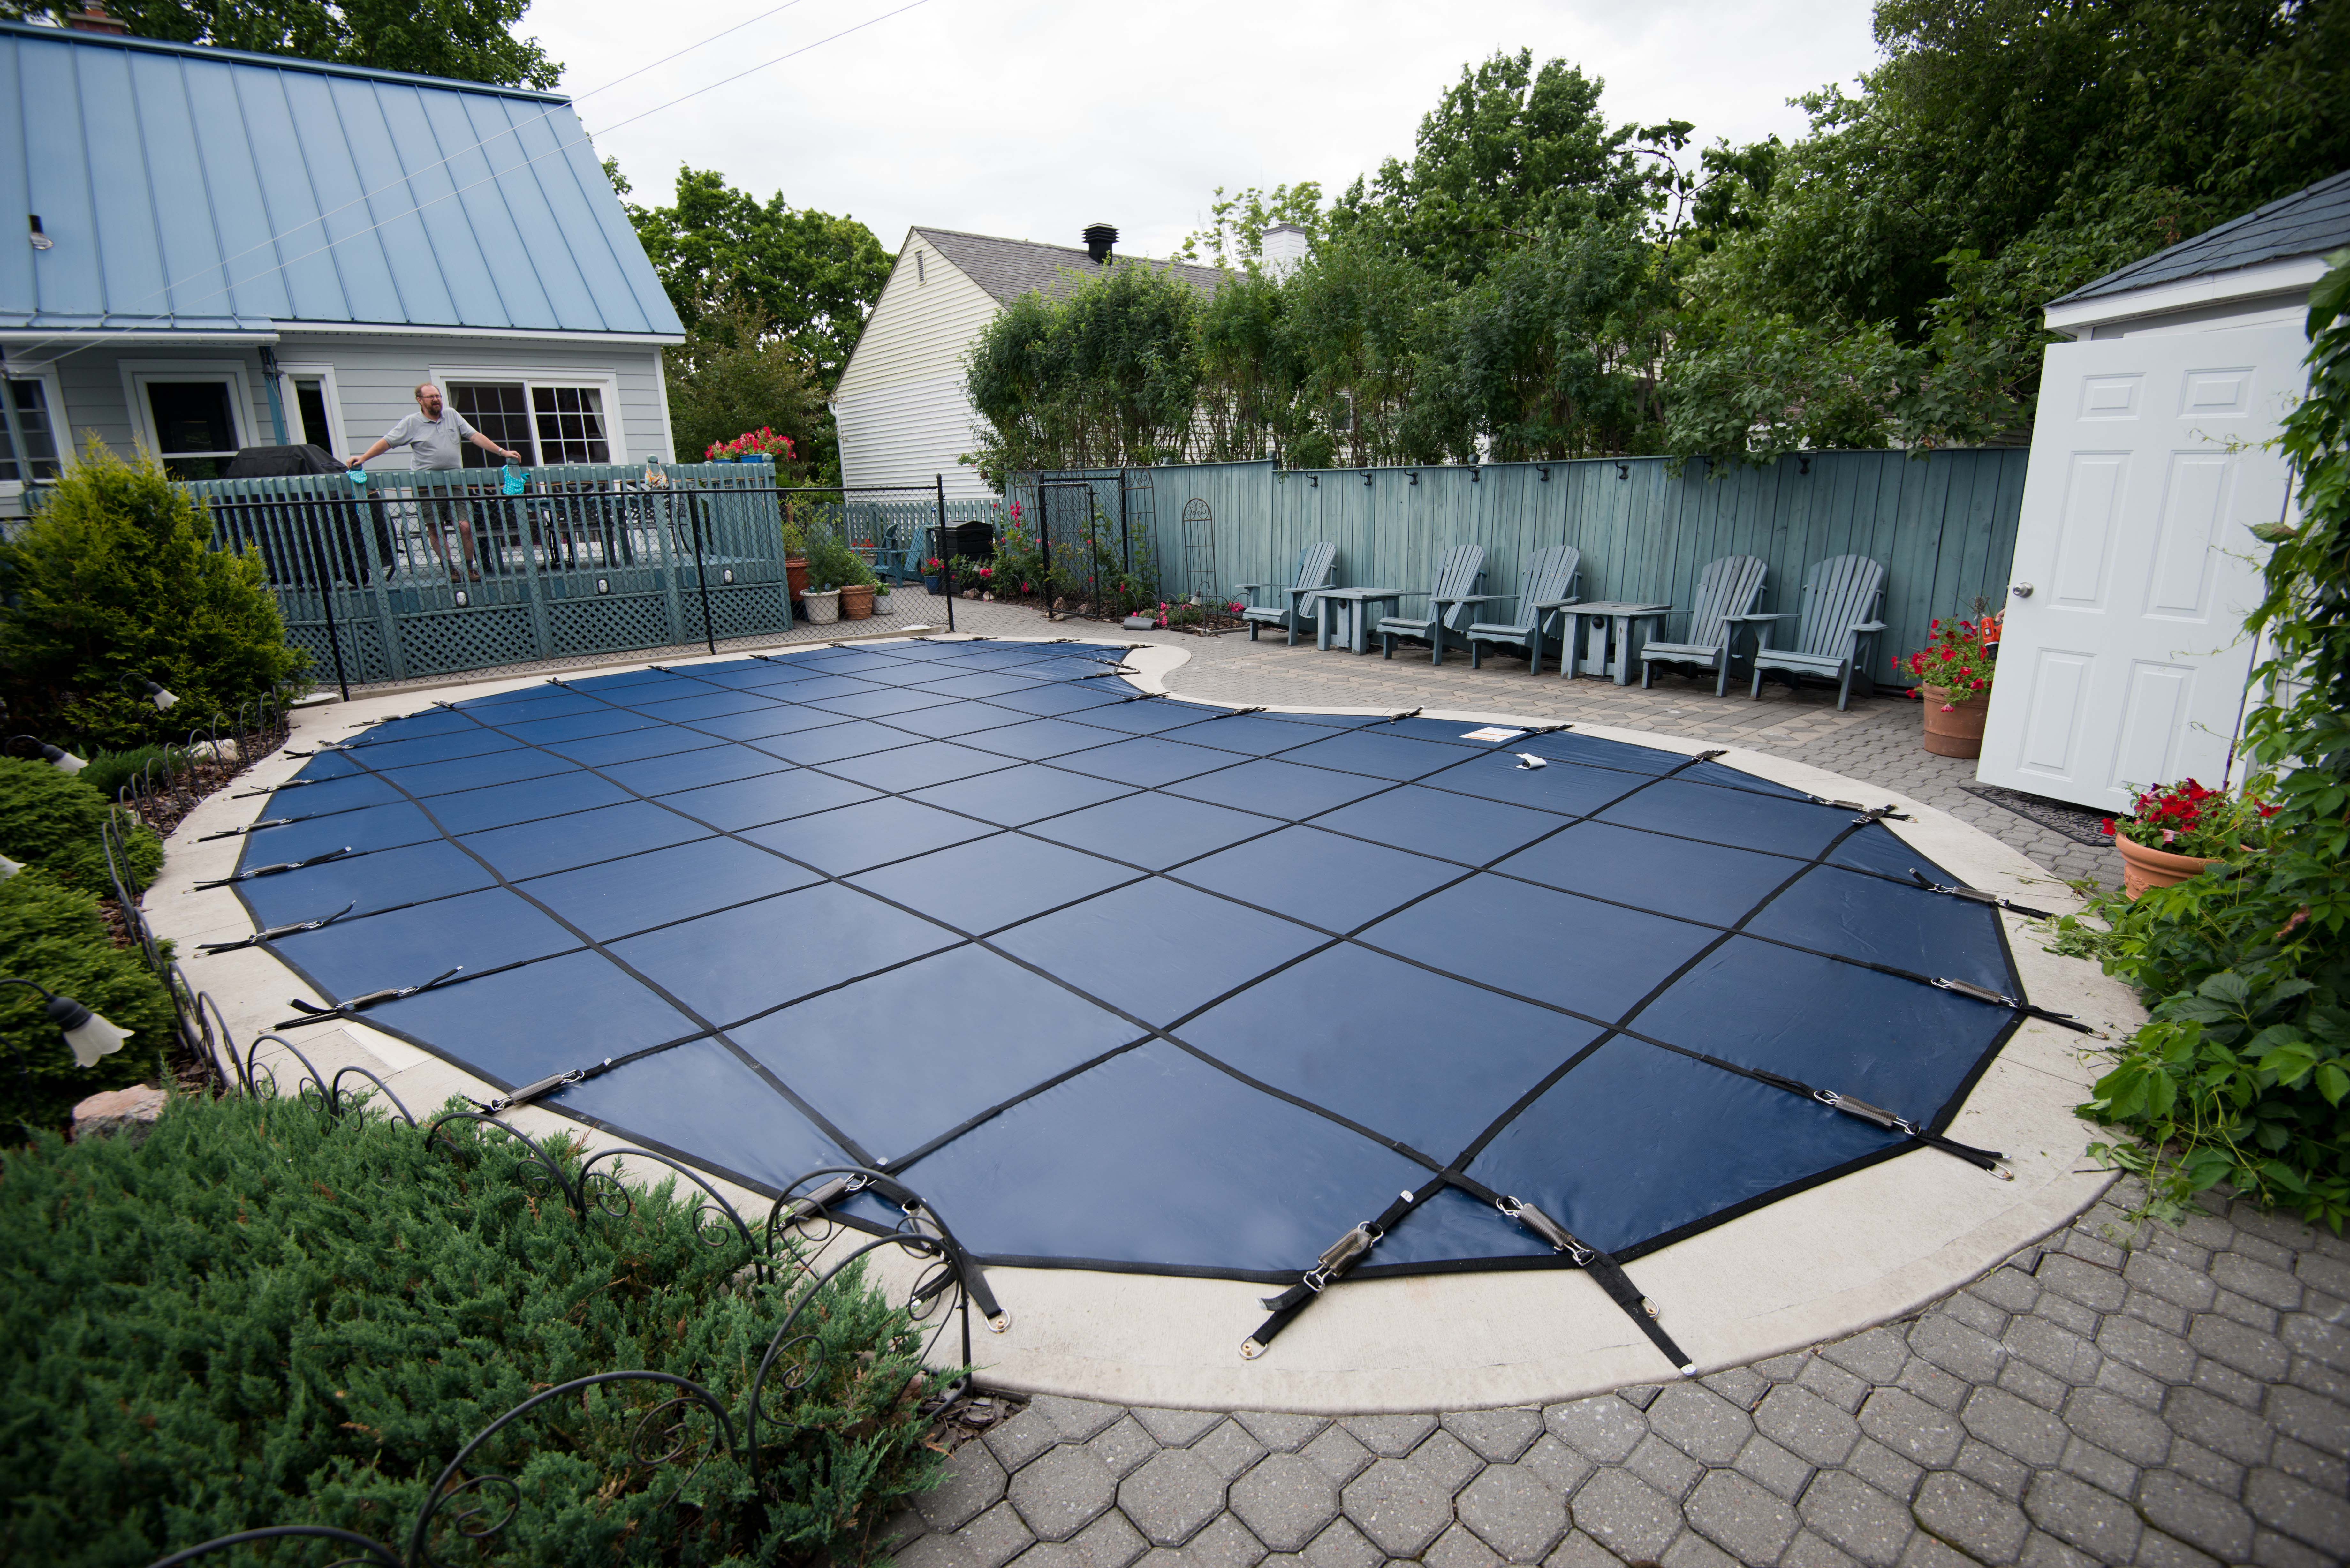 Swimming pool safety covers ottawa poolarama for Swimming pool safety covers inground